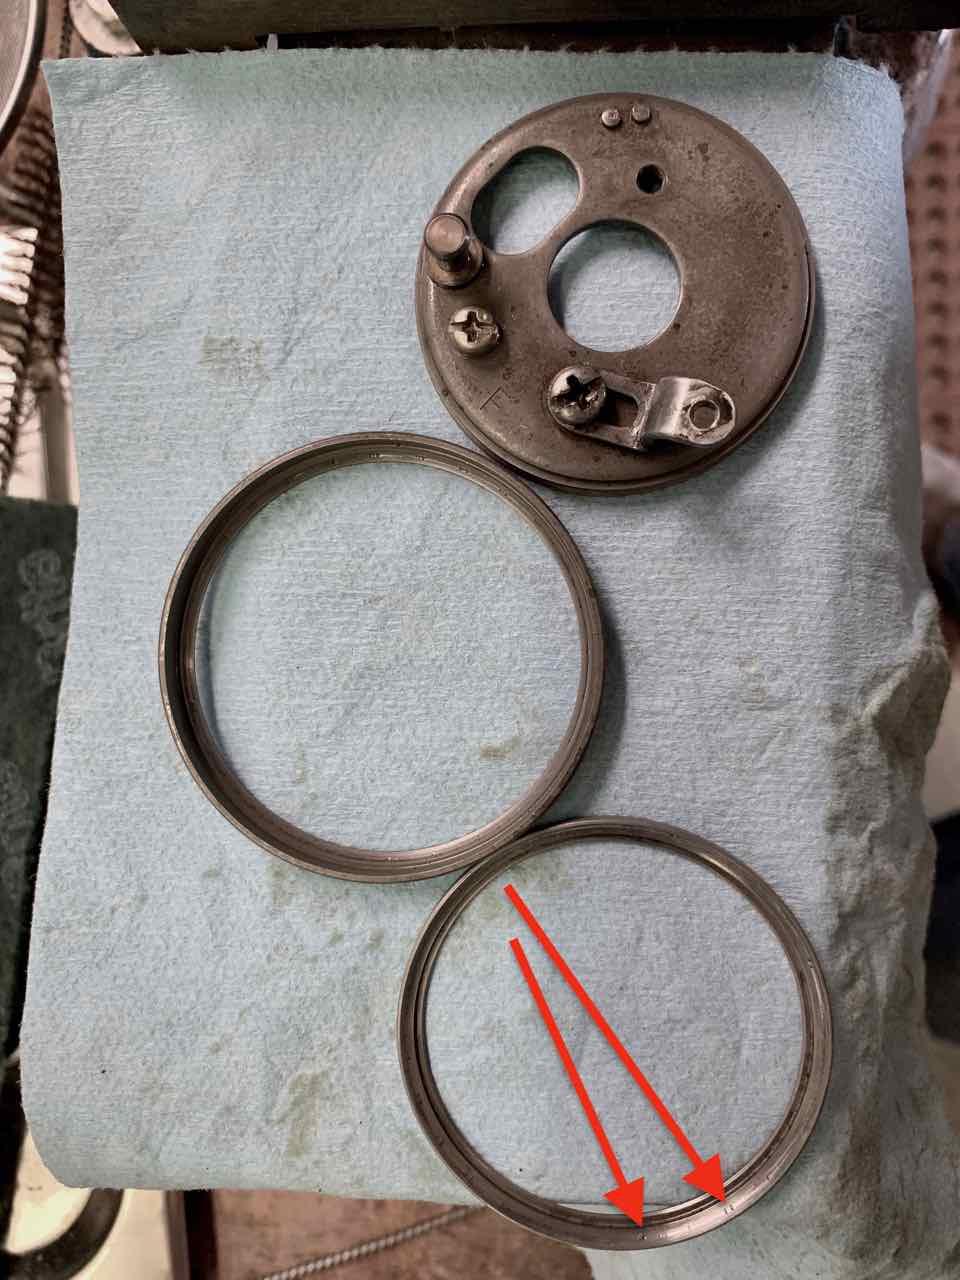 fj40 breaker plate 4 (1).jpg